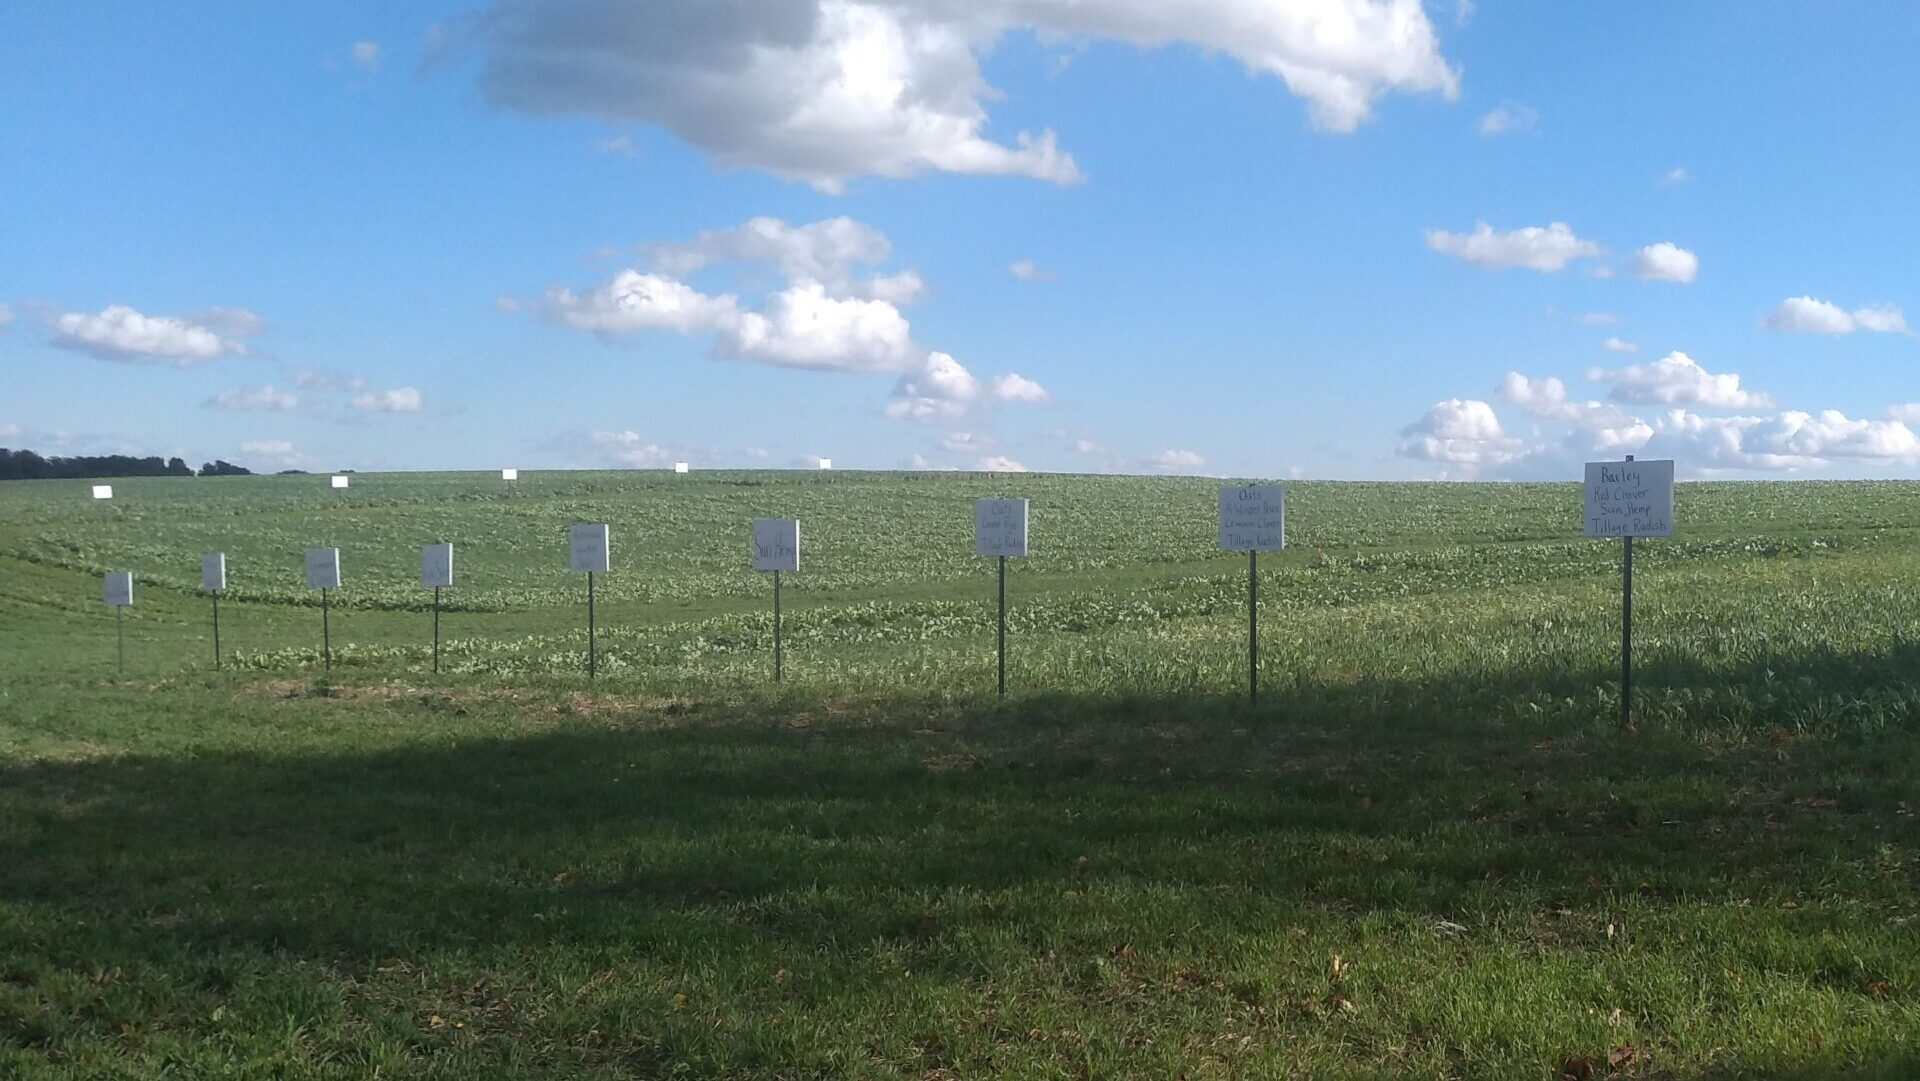 Lafayette County Farms make progress on conservation